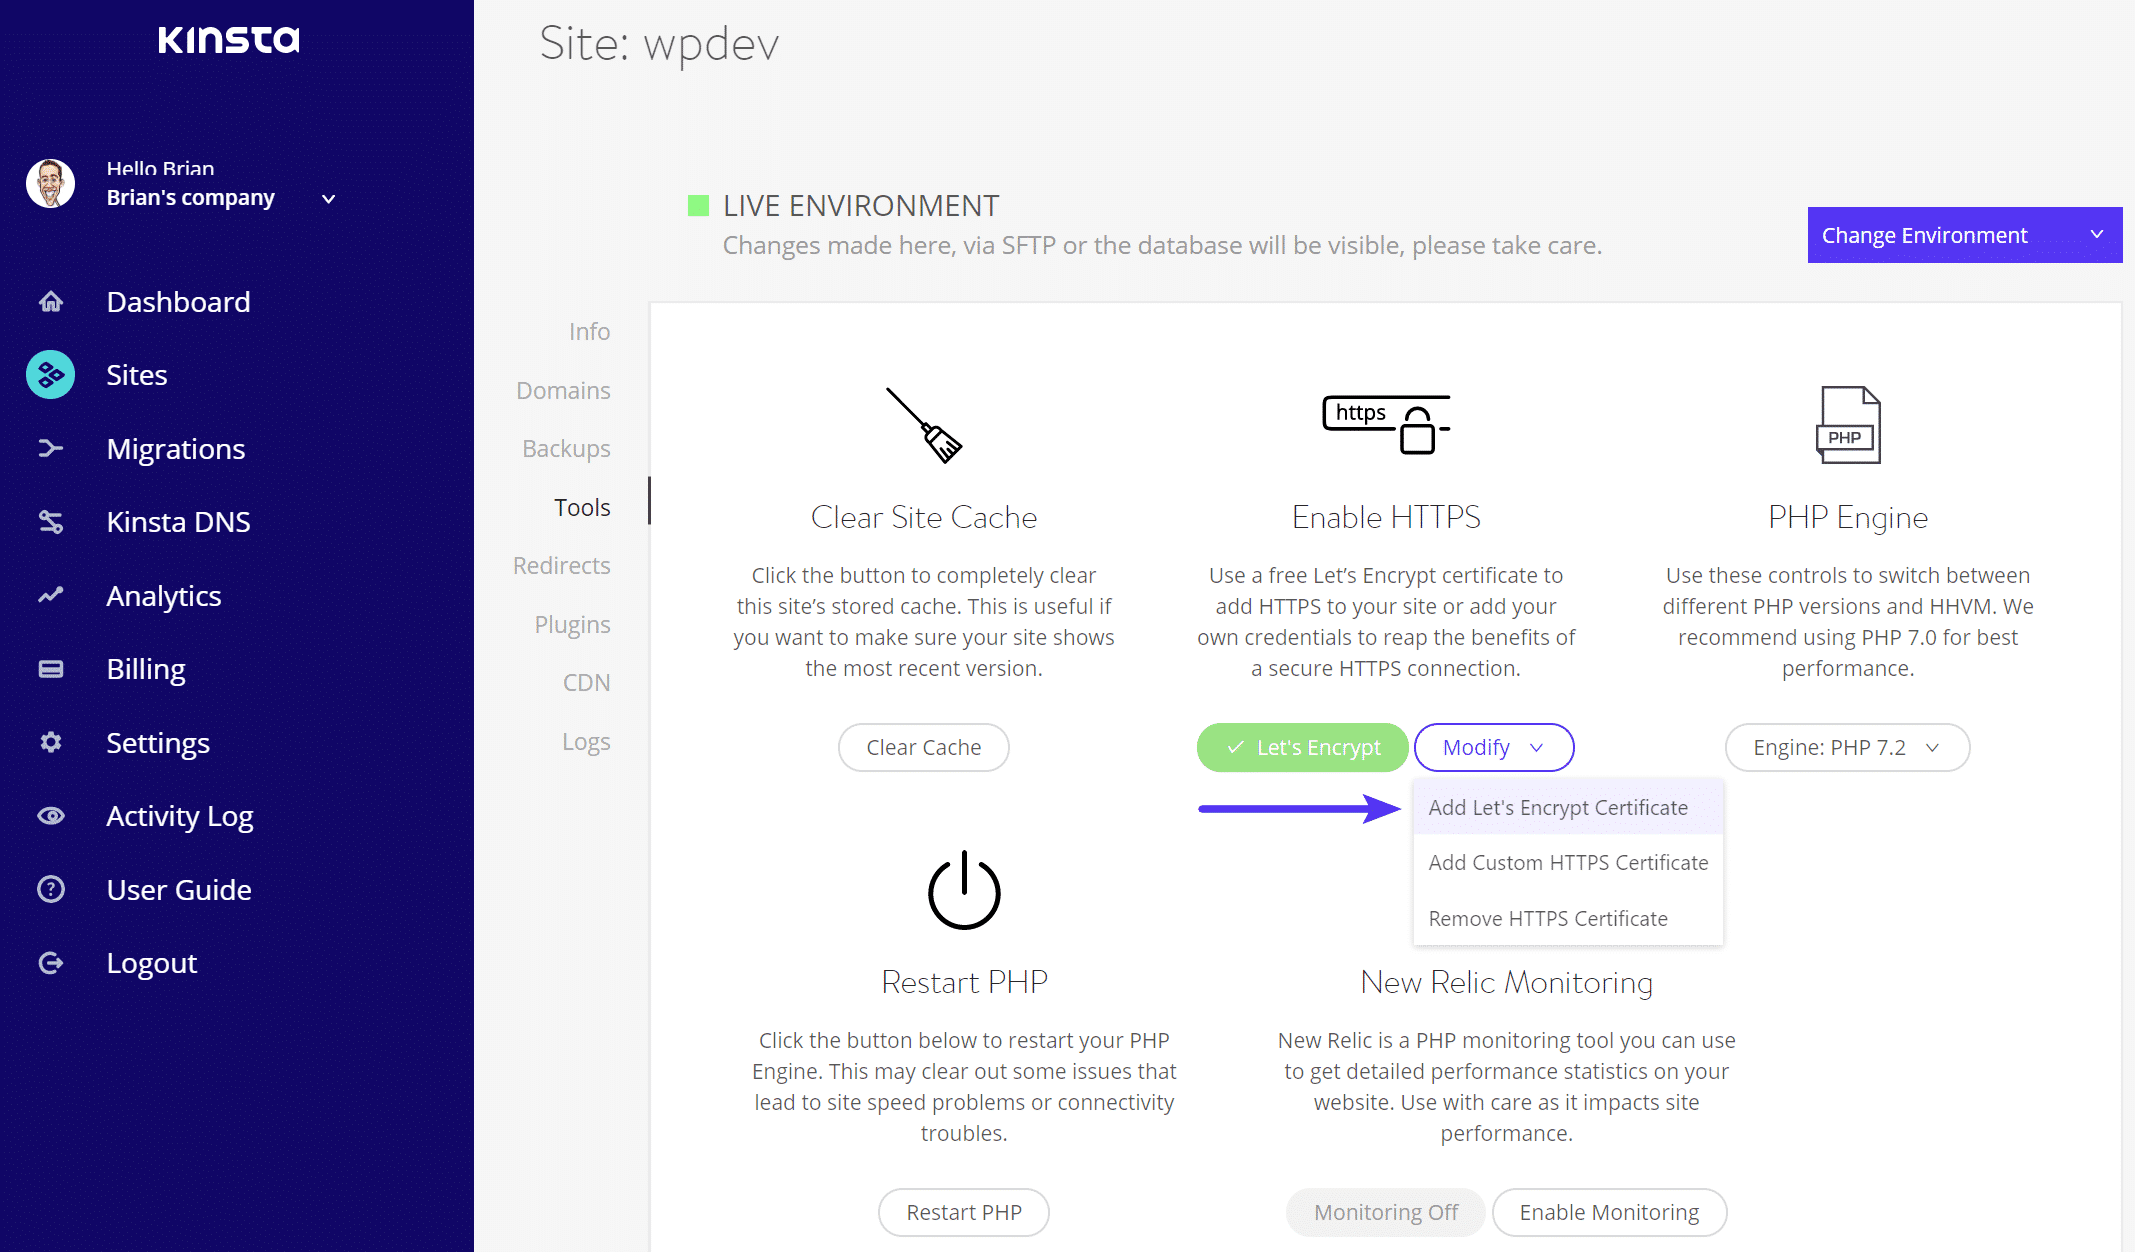 Agregar SSL (Let's Encrypt)